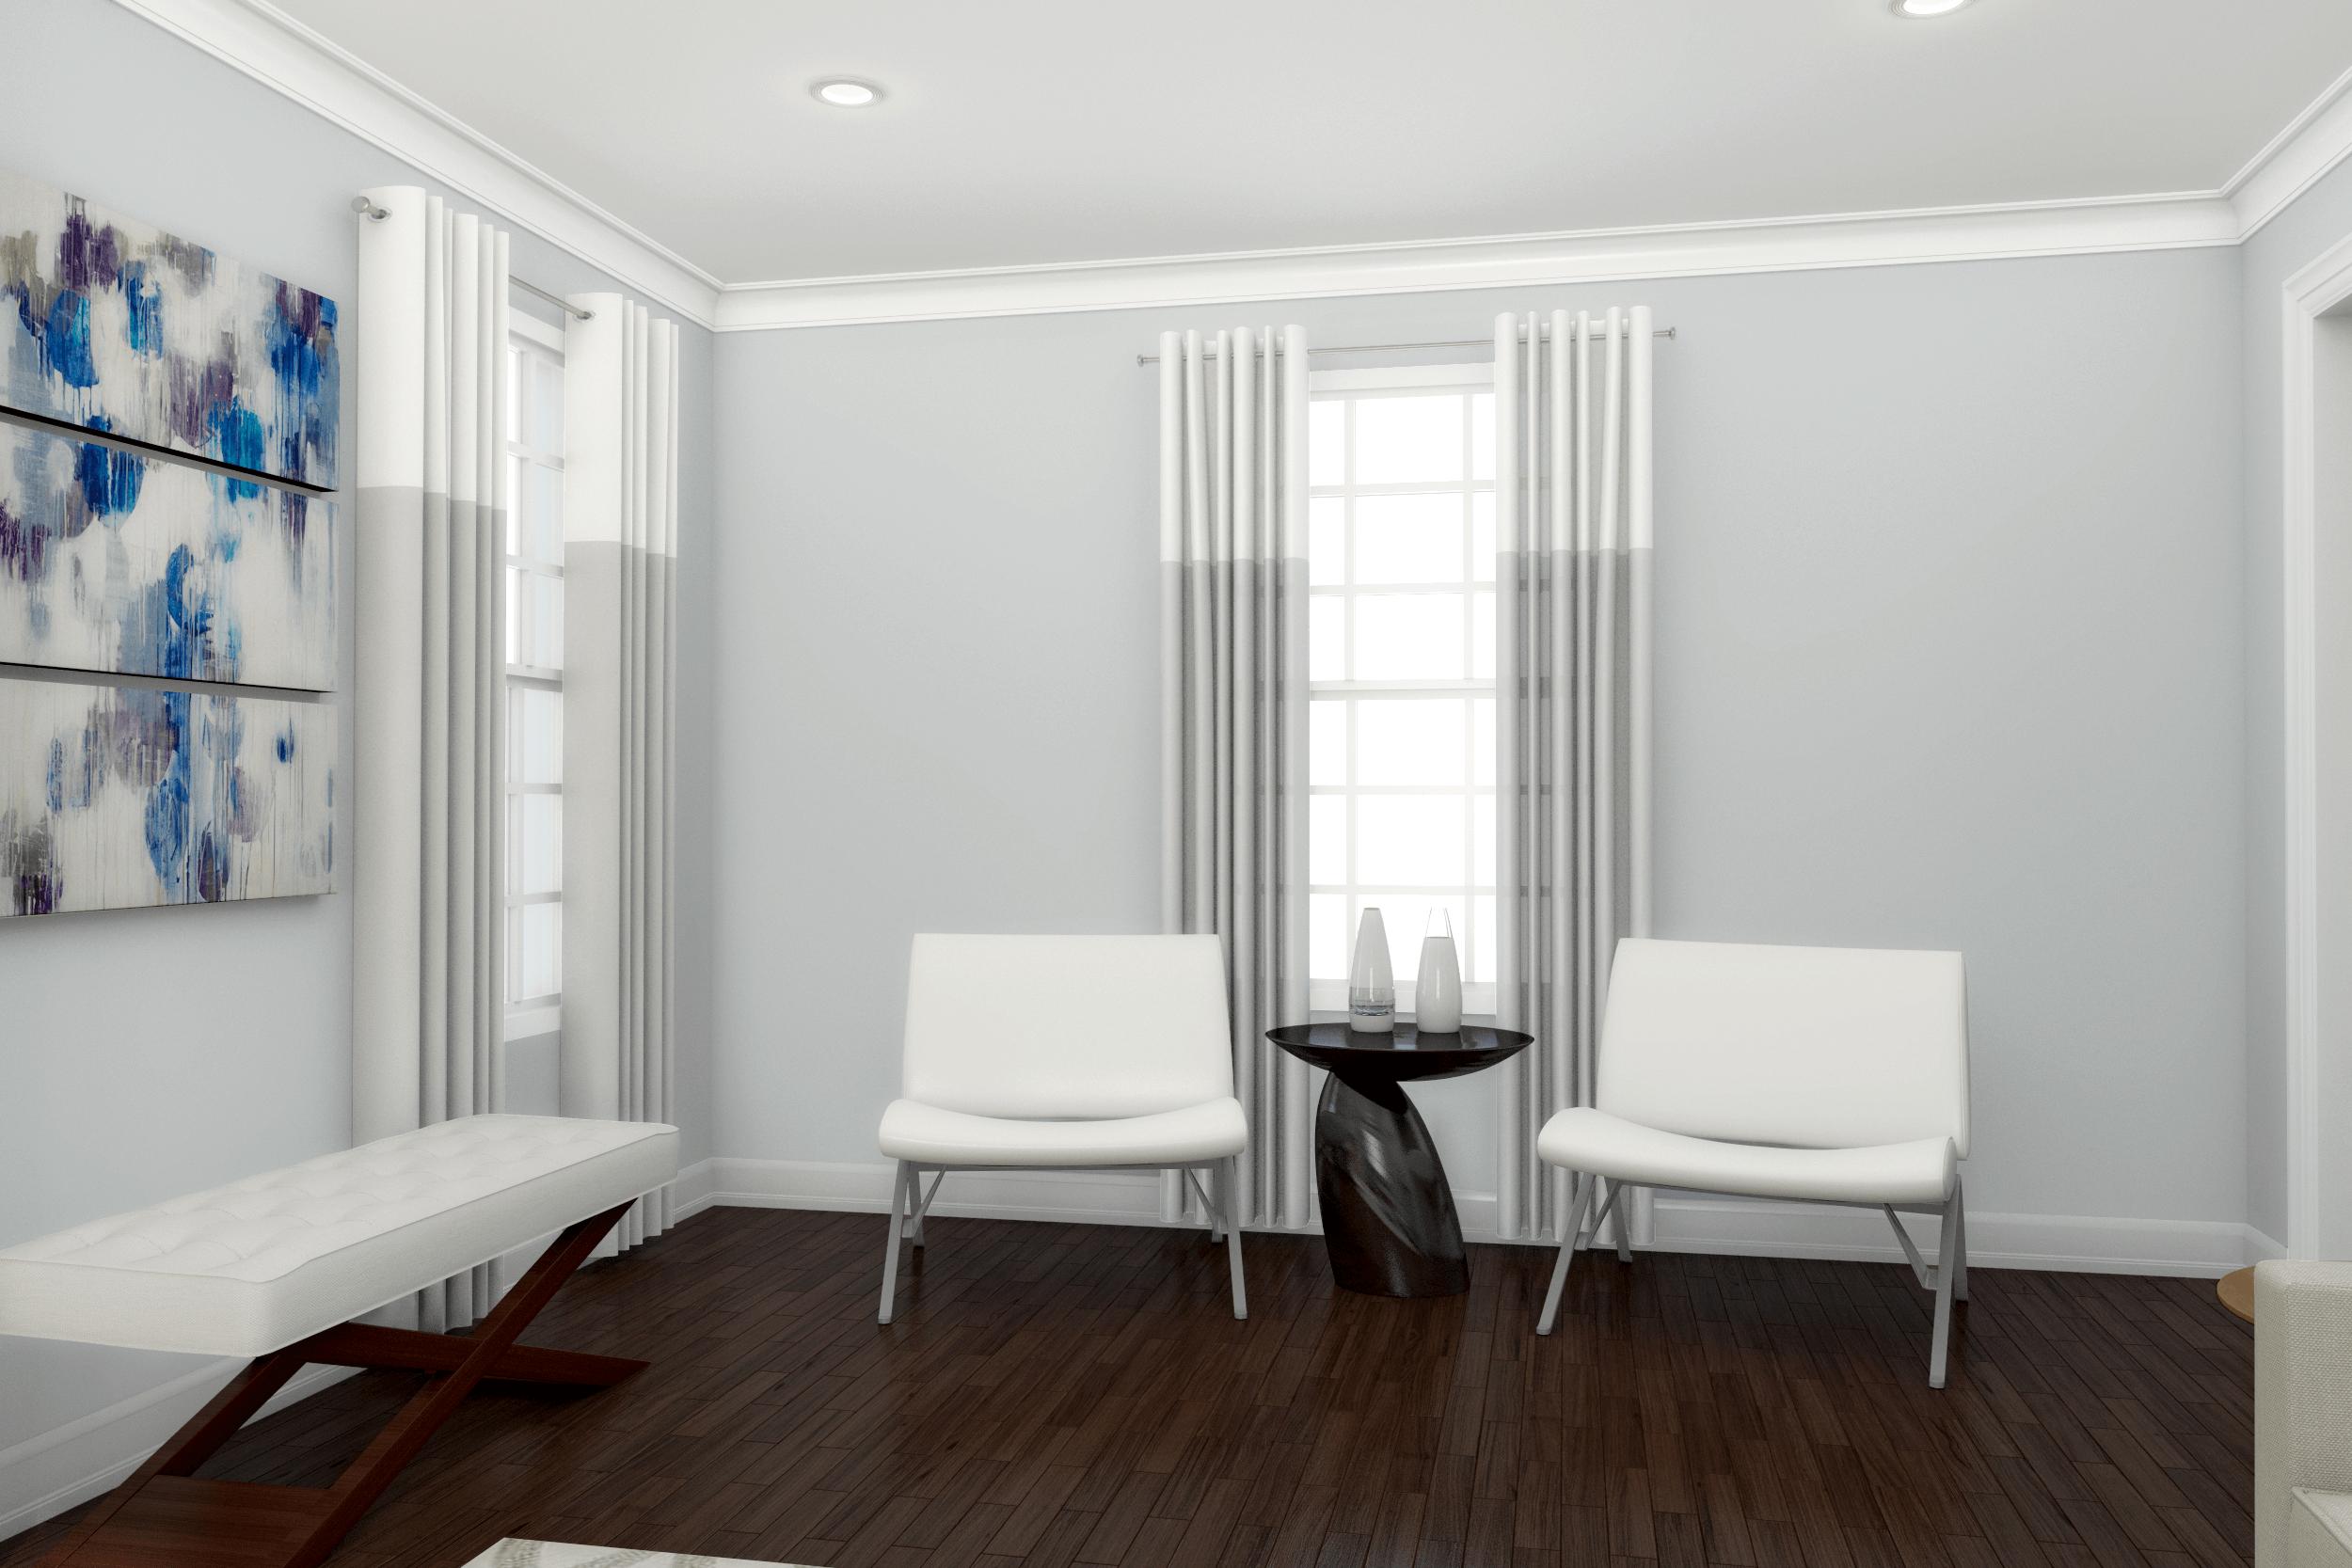 How to get a high-end contemporary living room design on a budget